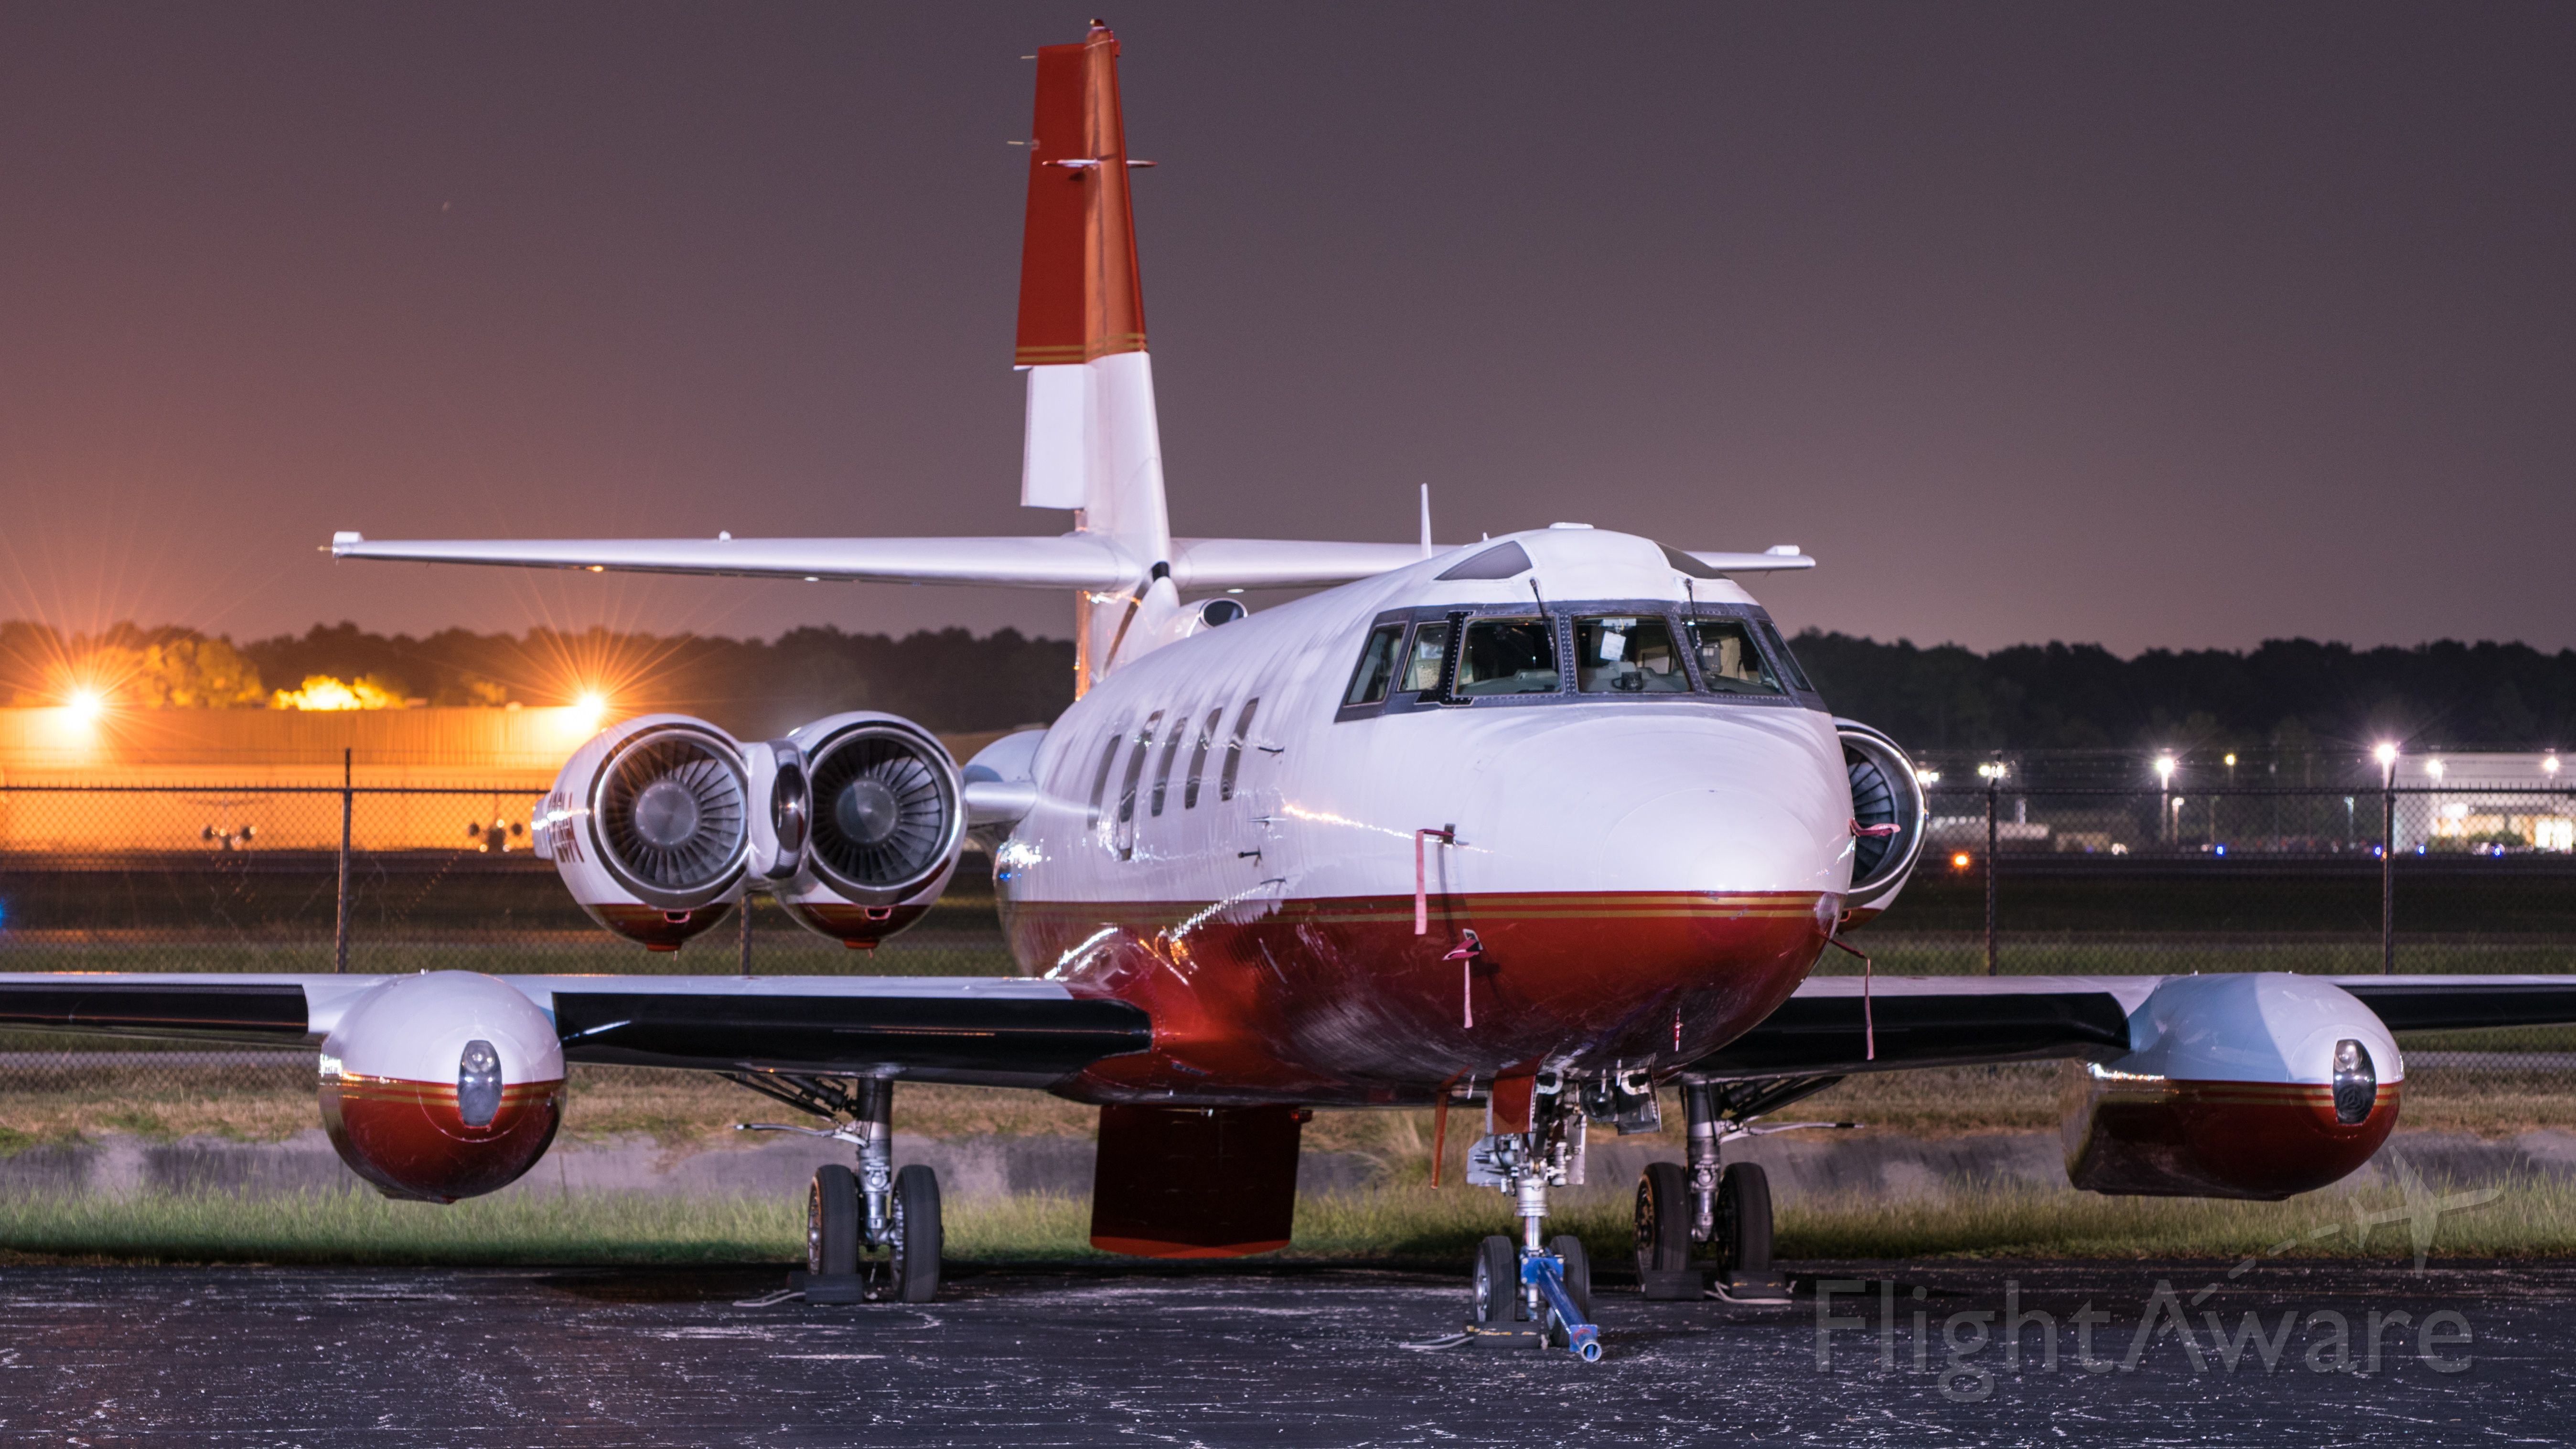 Lockheed Jetstar 2 (N72GW) - Jetstar resting on the ramp after undergoing engine